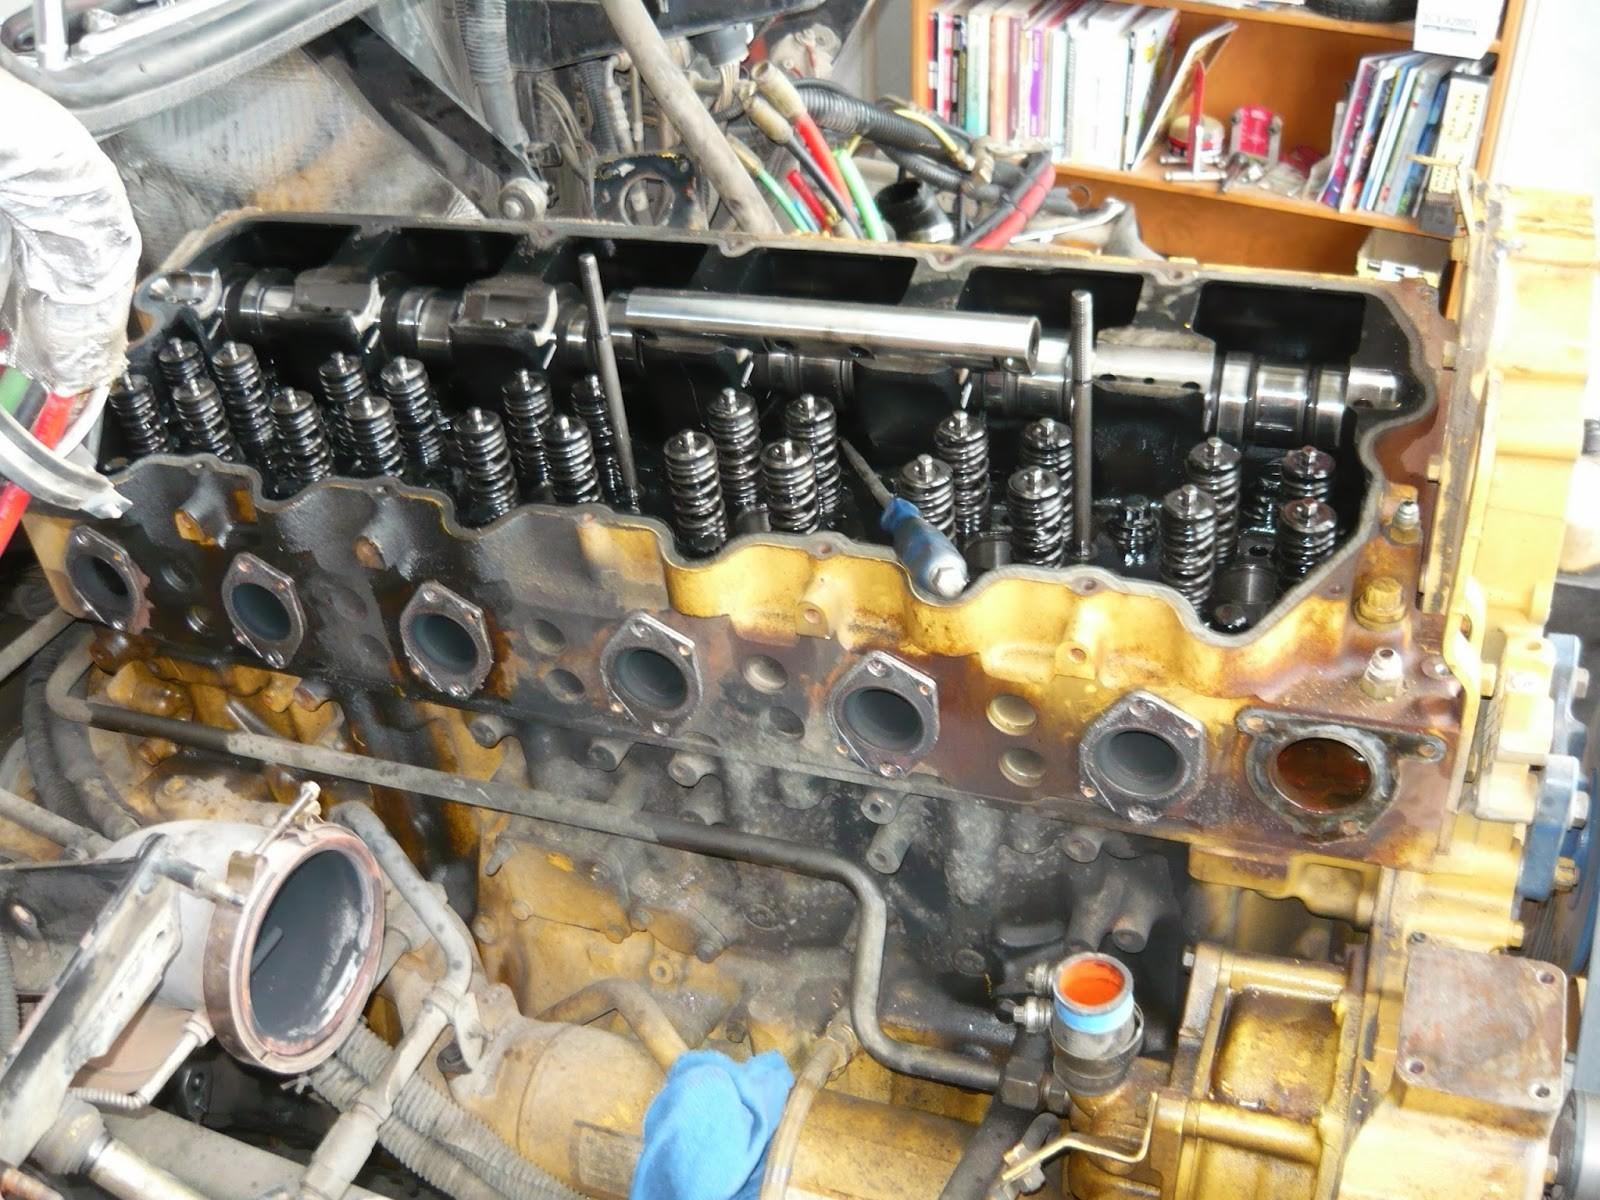 C13 Caterpillar Engine Diagram Christie Pacific Case History Caterpillar C12 Cylinder Head Failure Of C13 Caterpillar Engine Diagram